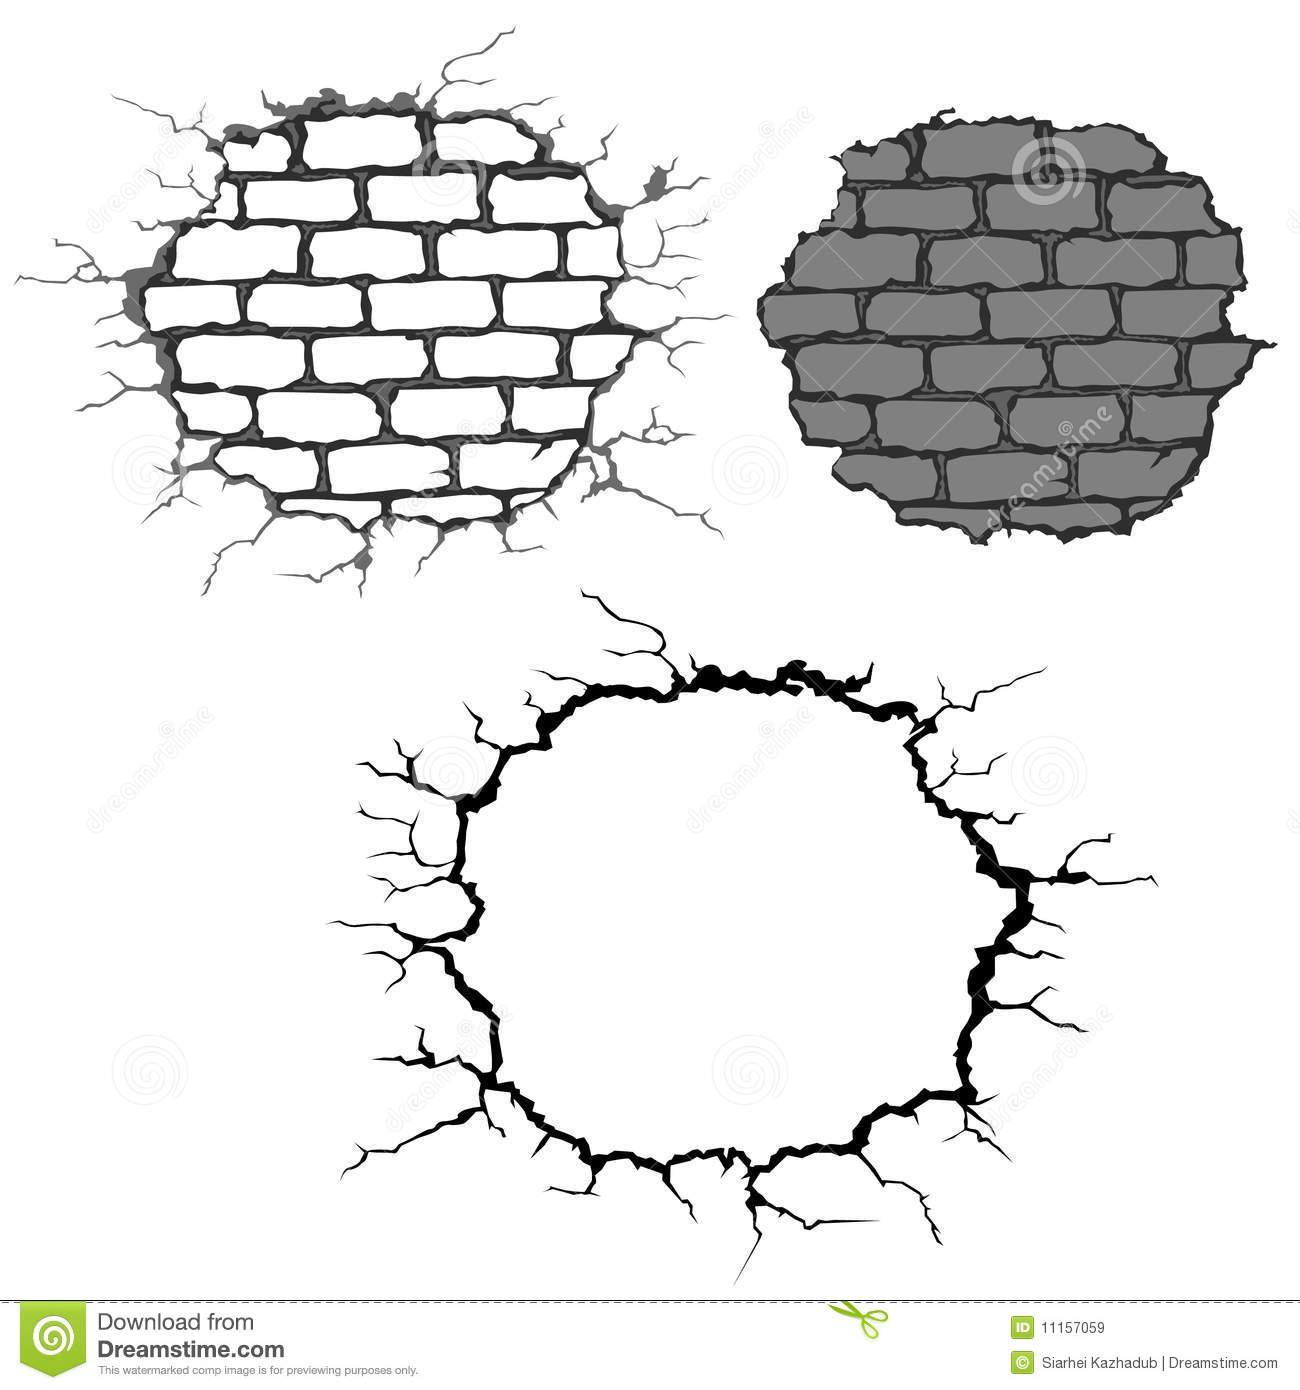 Cracked Brick Wall Clipart.